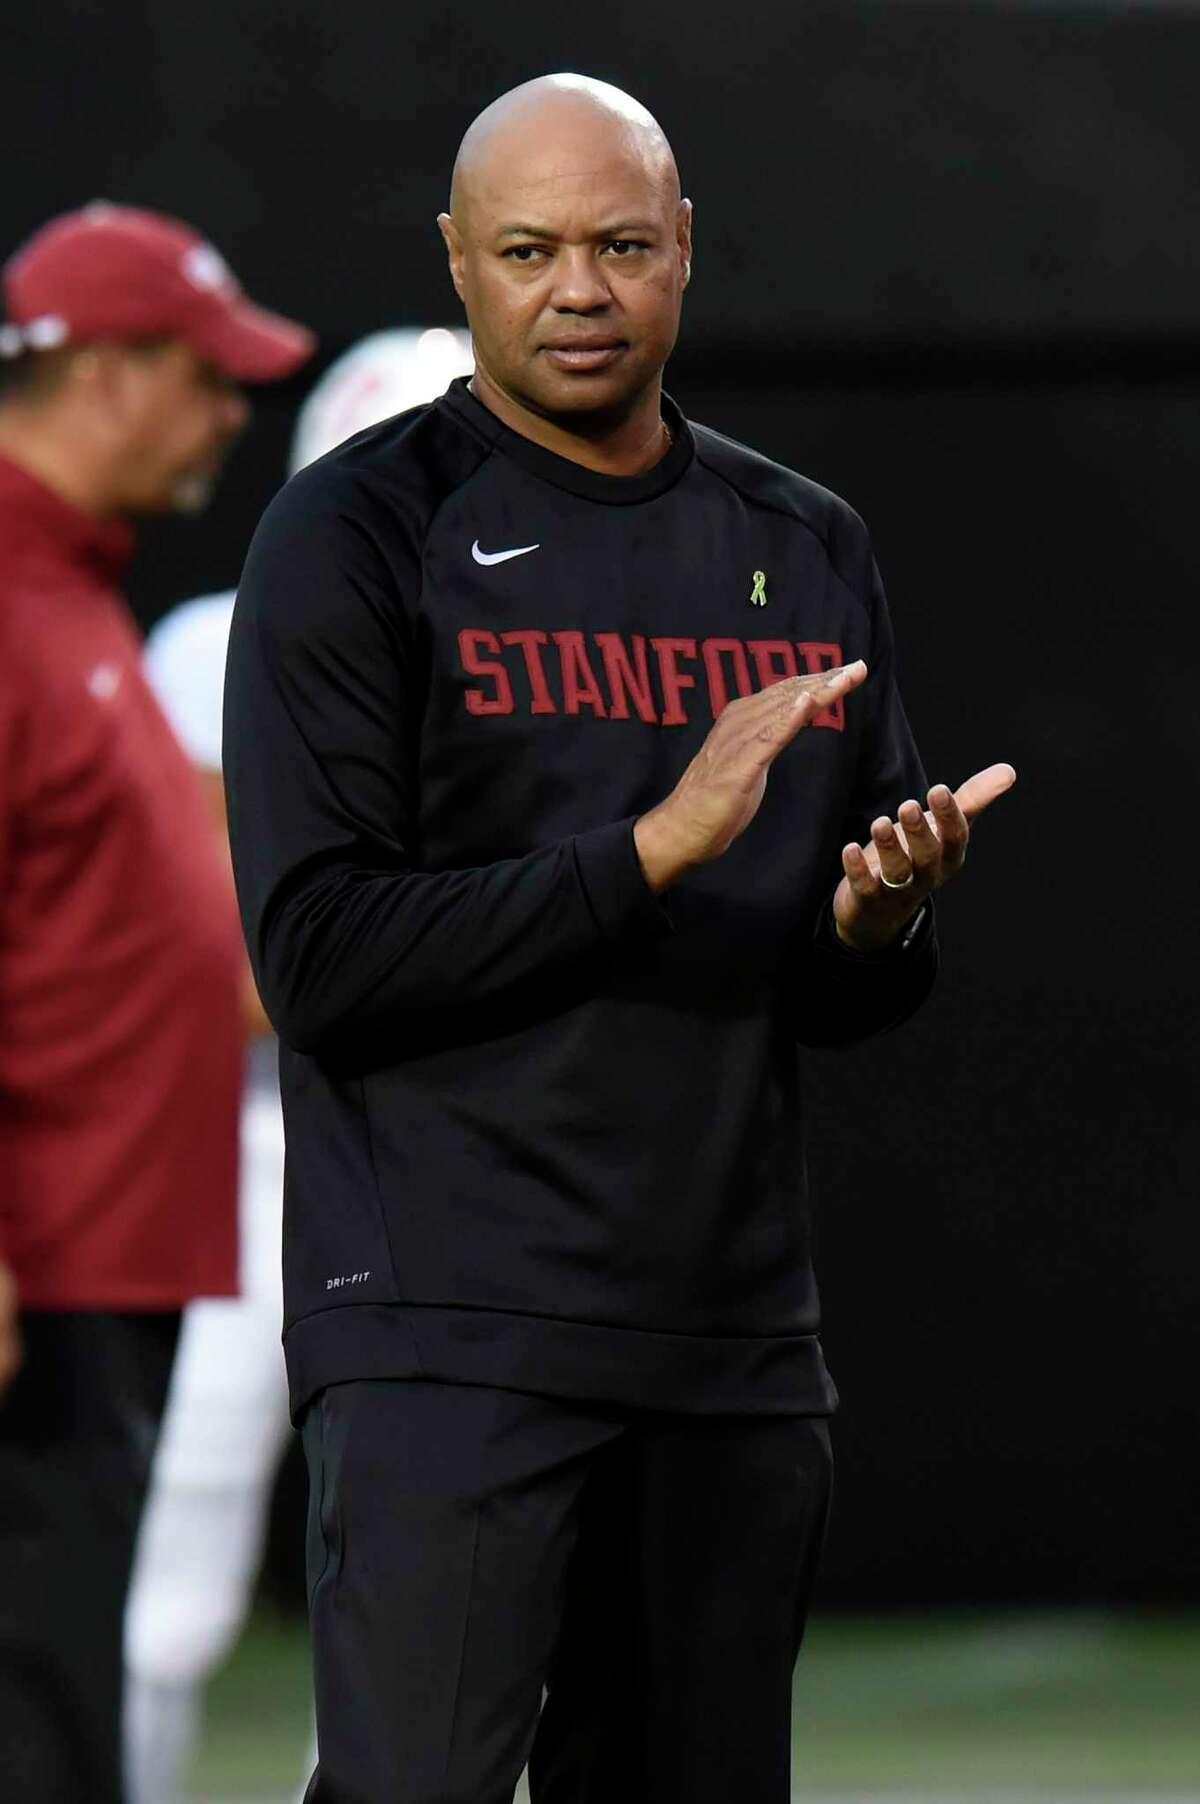 Stanford head coach David Shaw watches players warm up before an NCAA college football game against Vanderbilt Saturday, Sept. 18, 2021, in Nashville, Tenn. (AP Photo/Mark Zaleski)